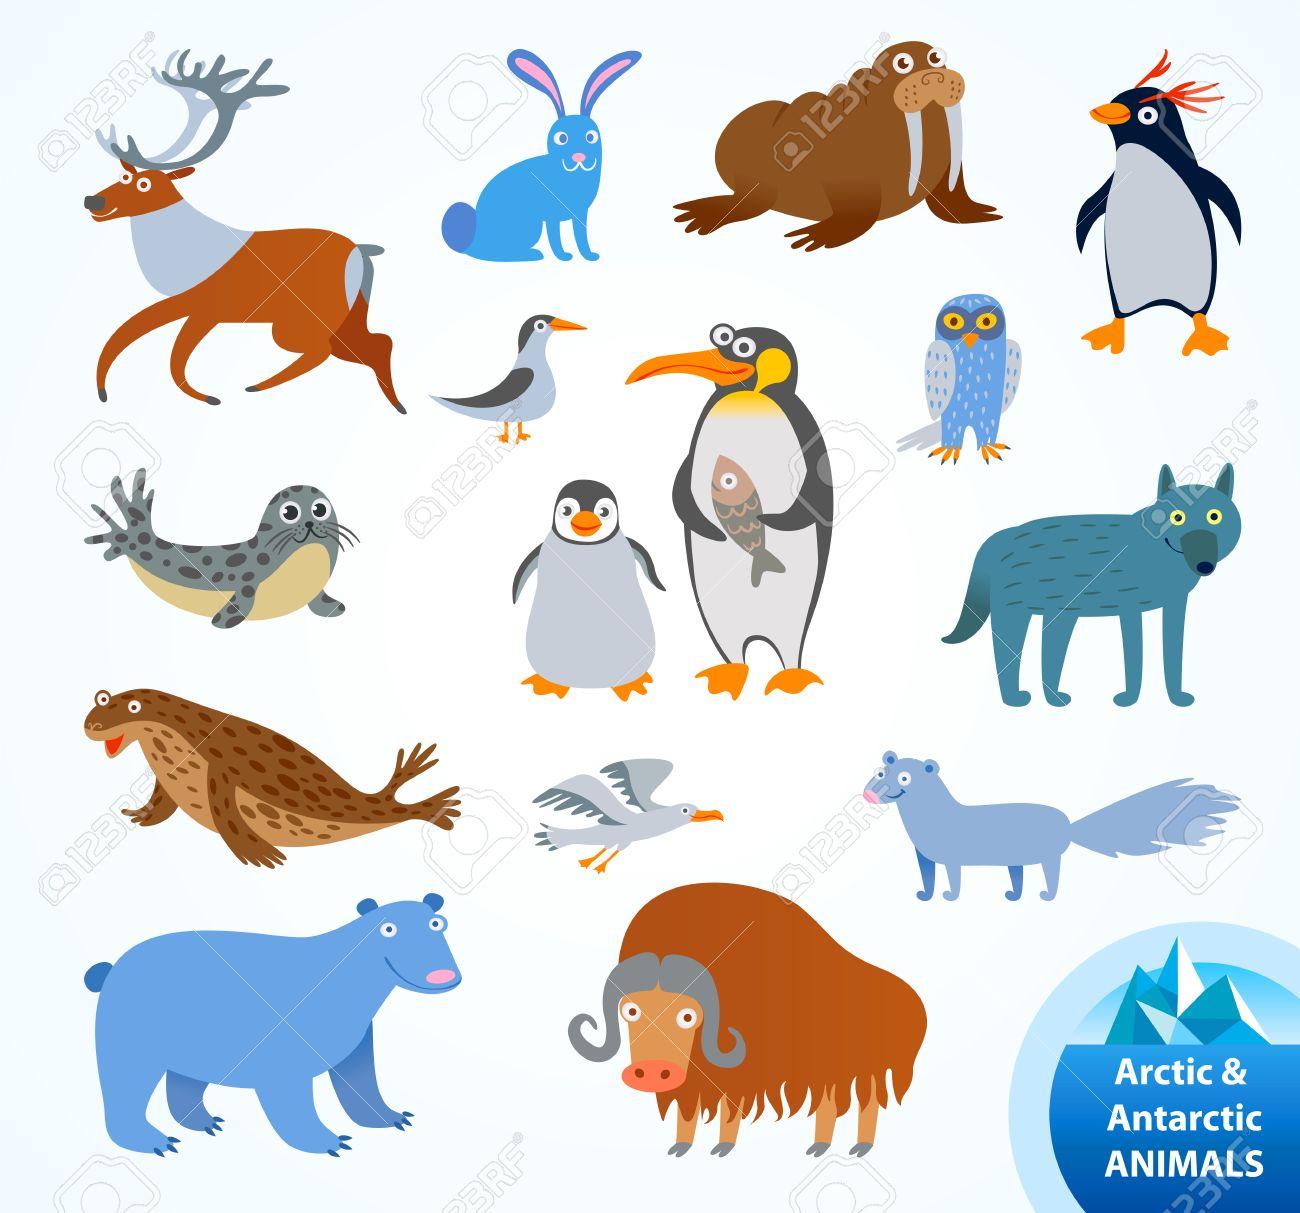 Set funny Arctic and Antarctic animals. Penguin, polar bear, seal, walrus, arctic fox, musk-ox, hare, reindeer, wolf, snowy owl, albatross, arctic tern. Funny cartoon character. Vector illustration - 50123136